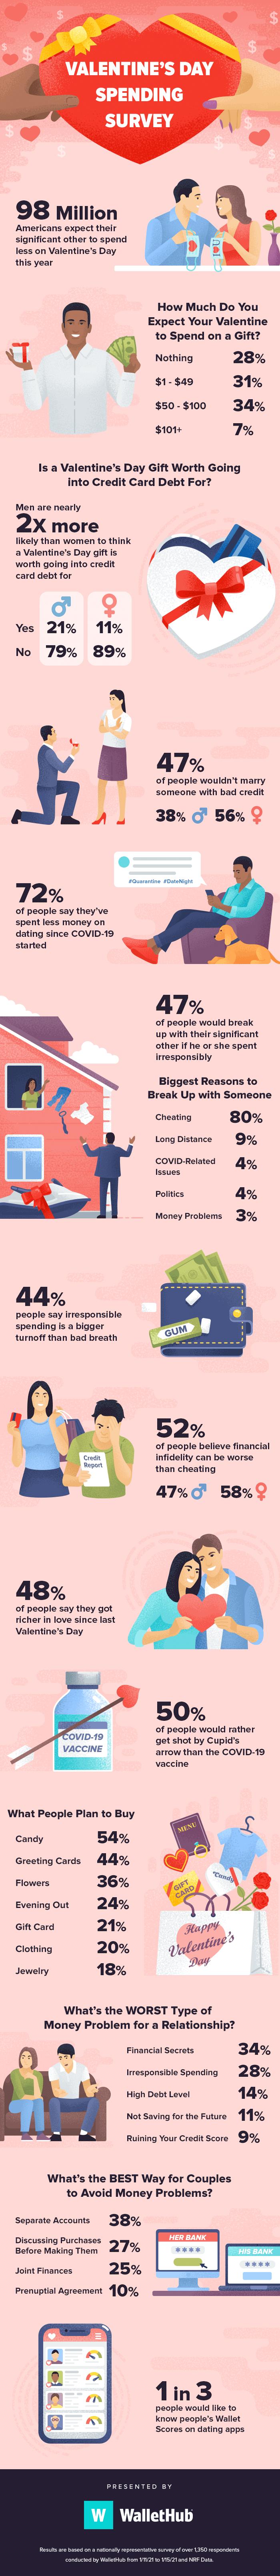 2021 valentines day spending survey